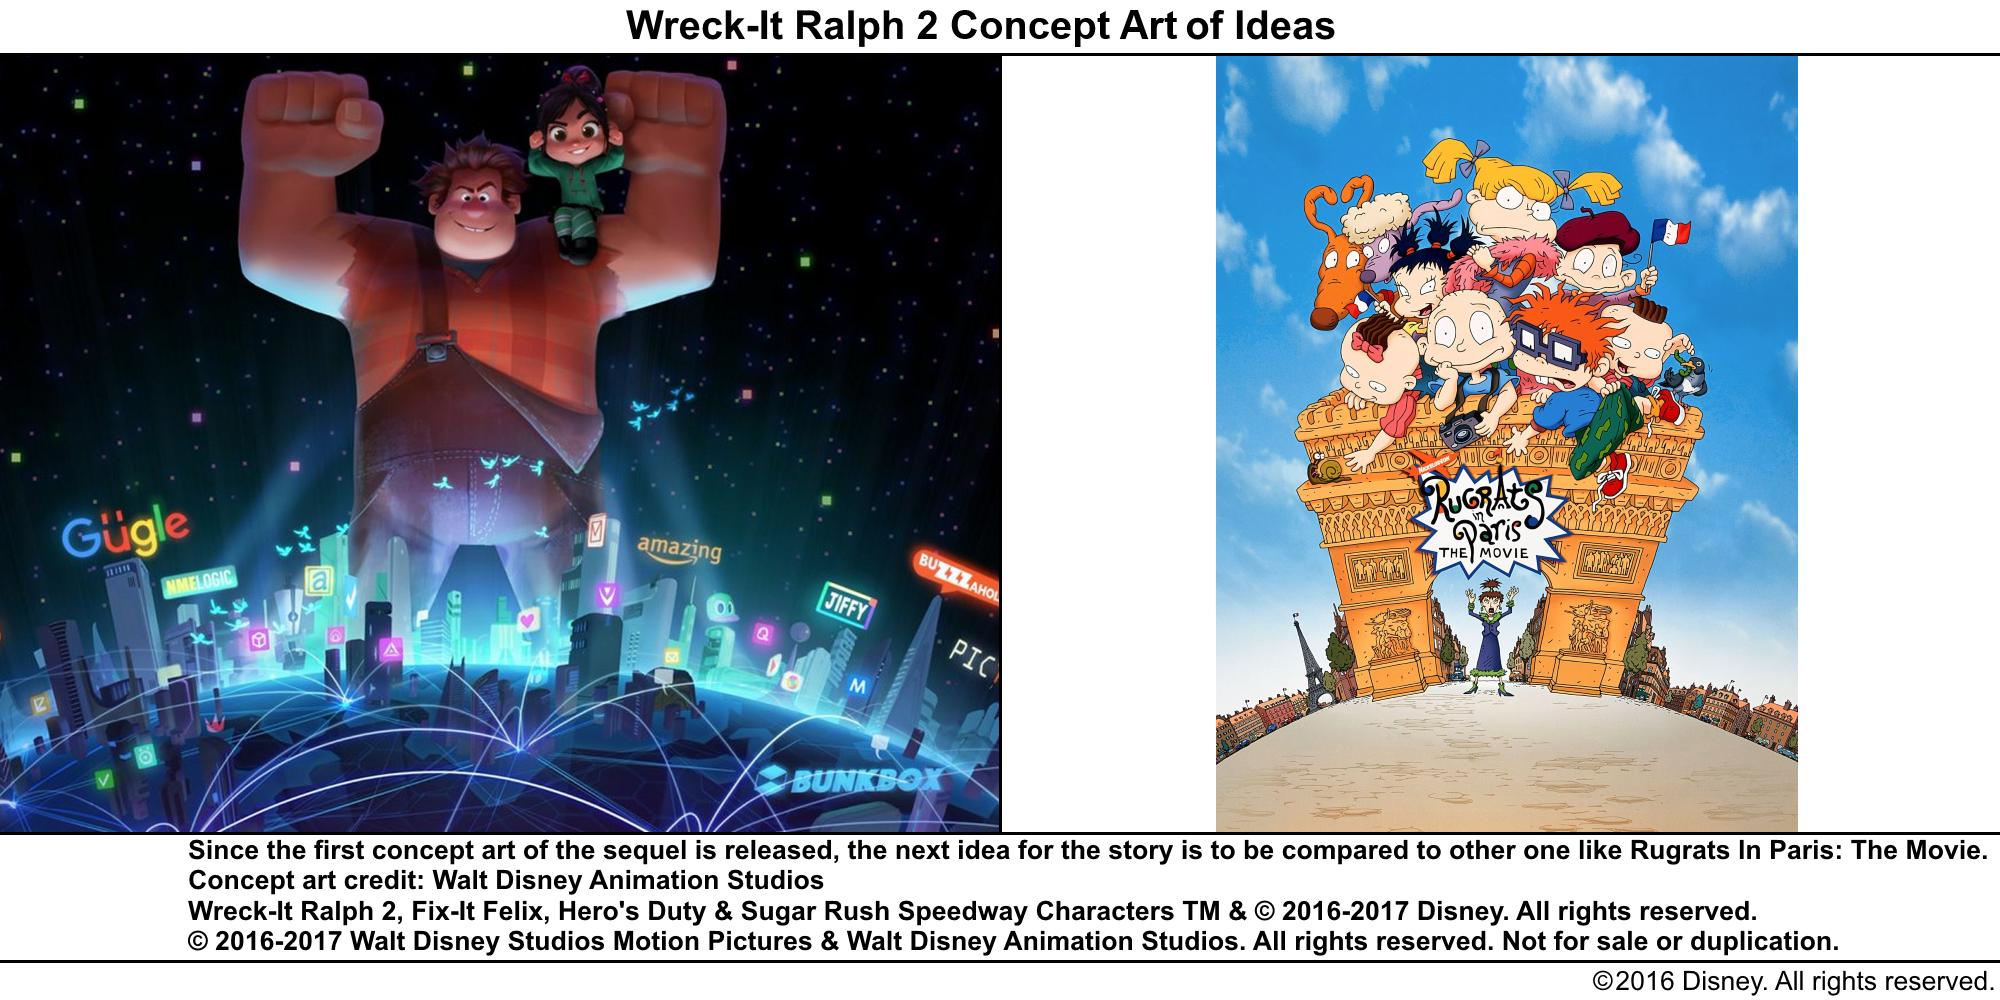 Best Lines From Wreck It Ralph 2: Wreck-It Ralph 2 Concept Art Of Ideas 41.png